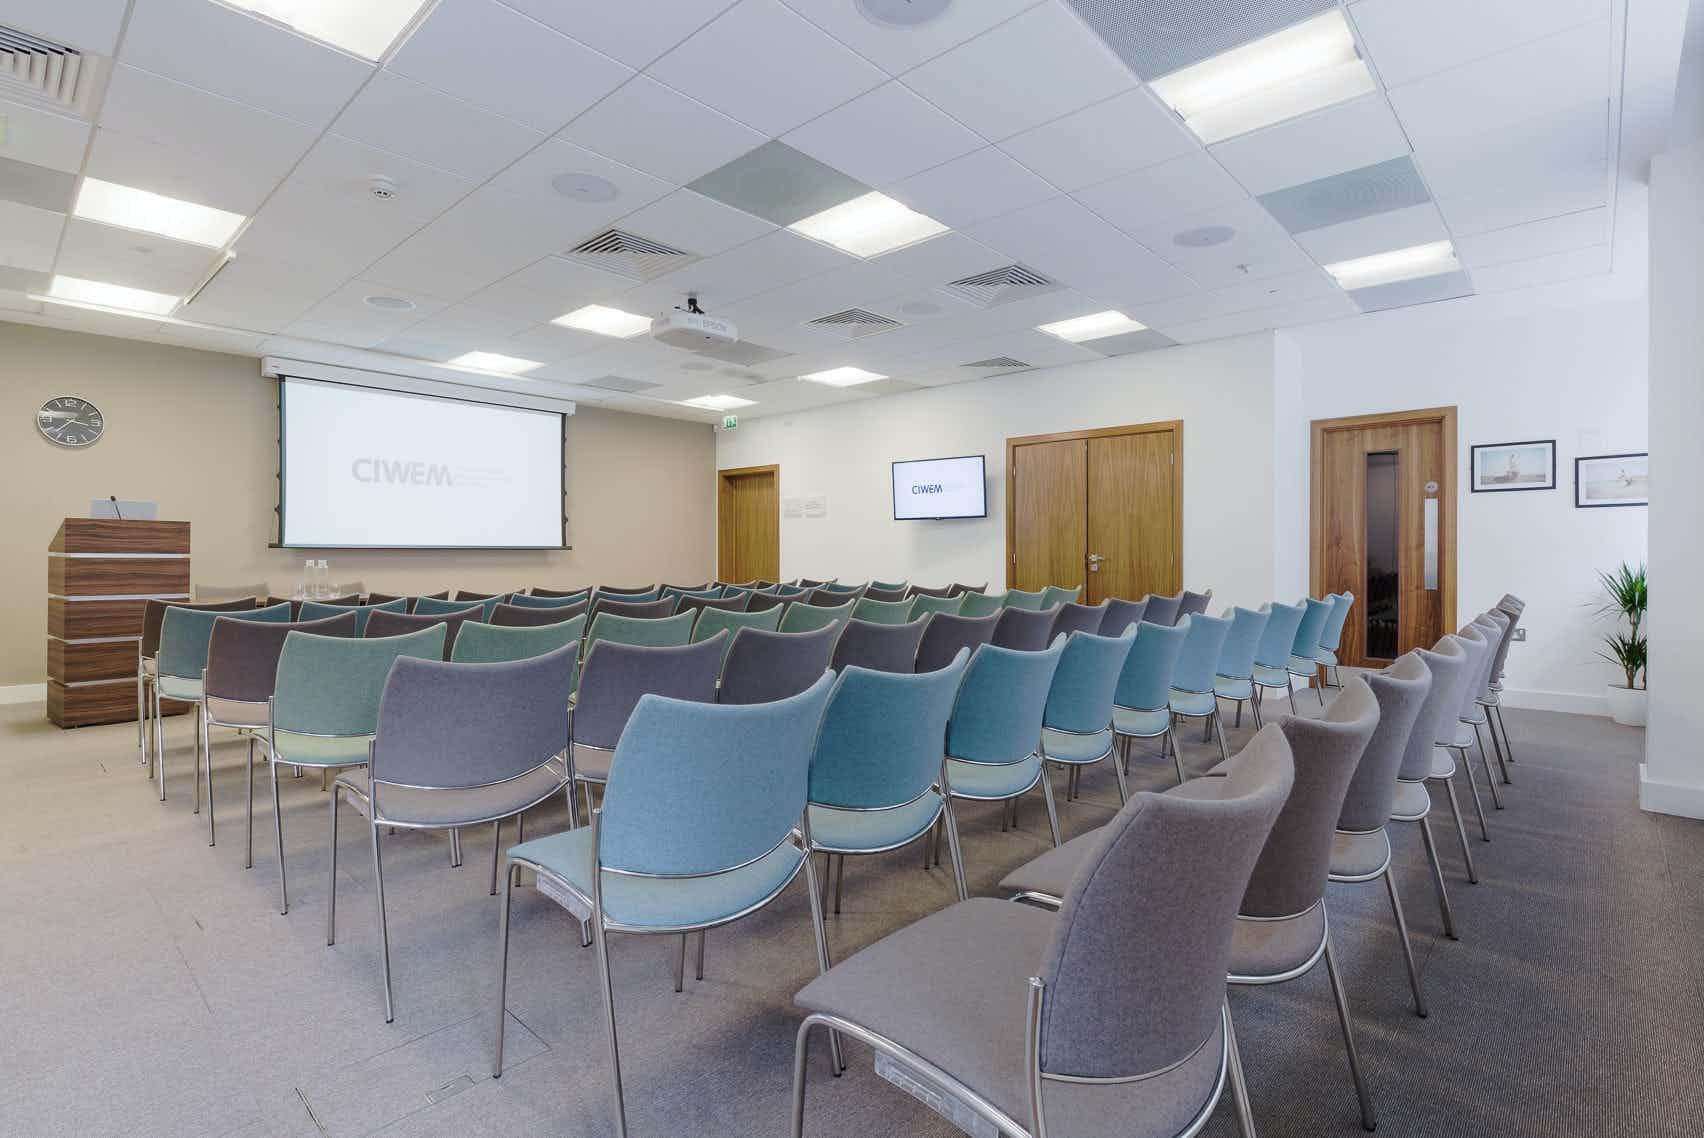 Amazon Room, CIWEM Venue